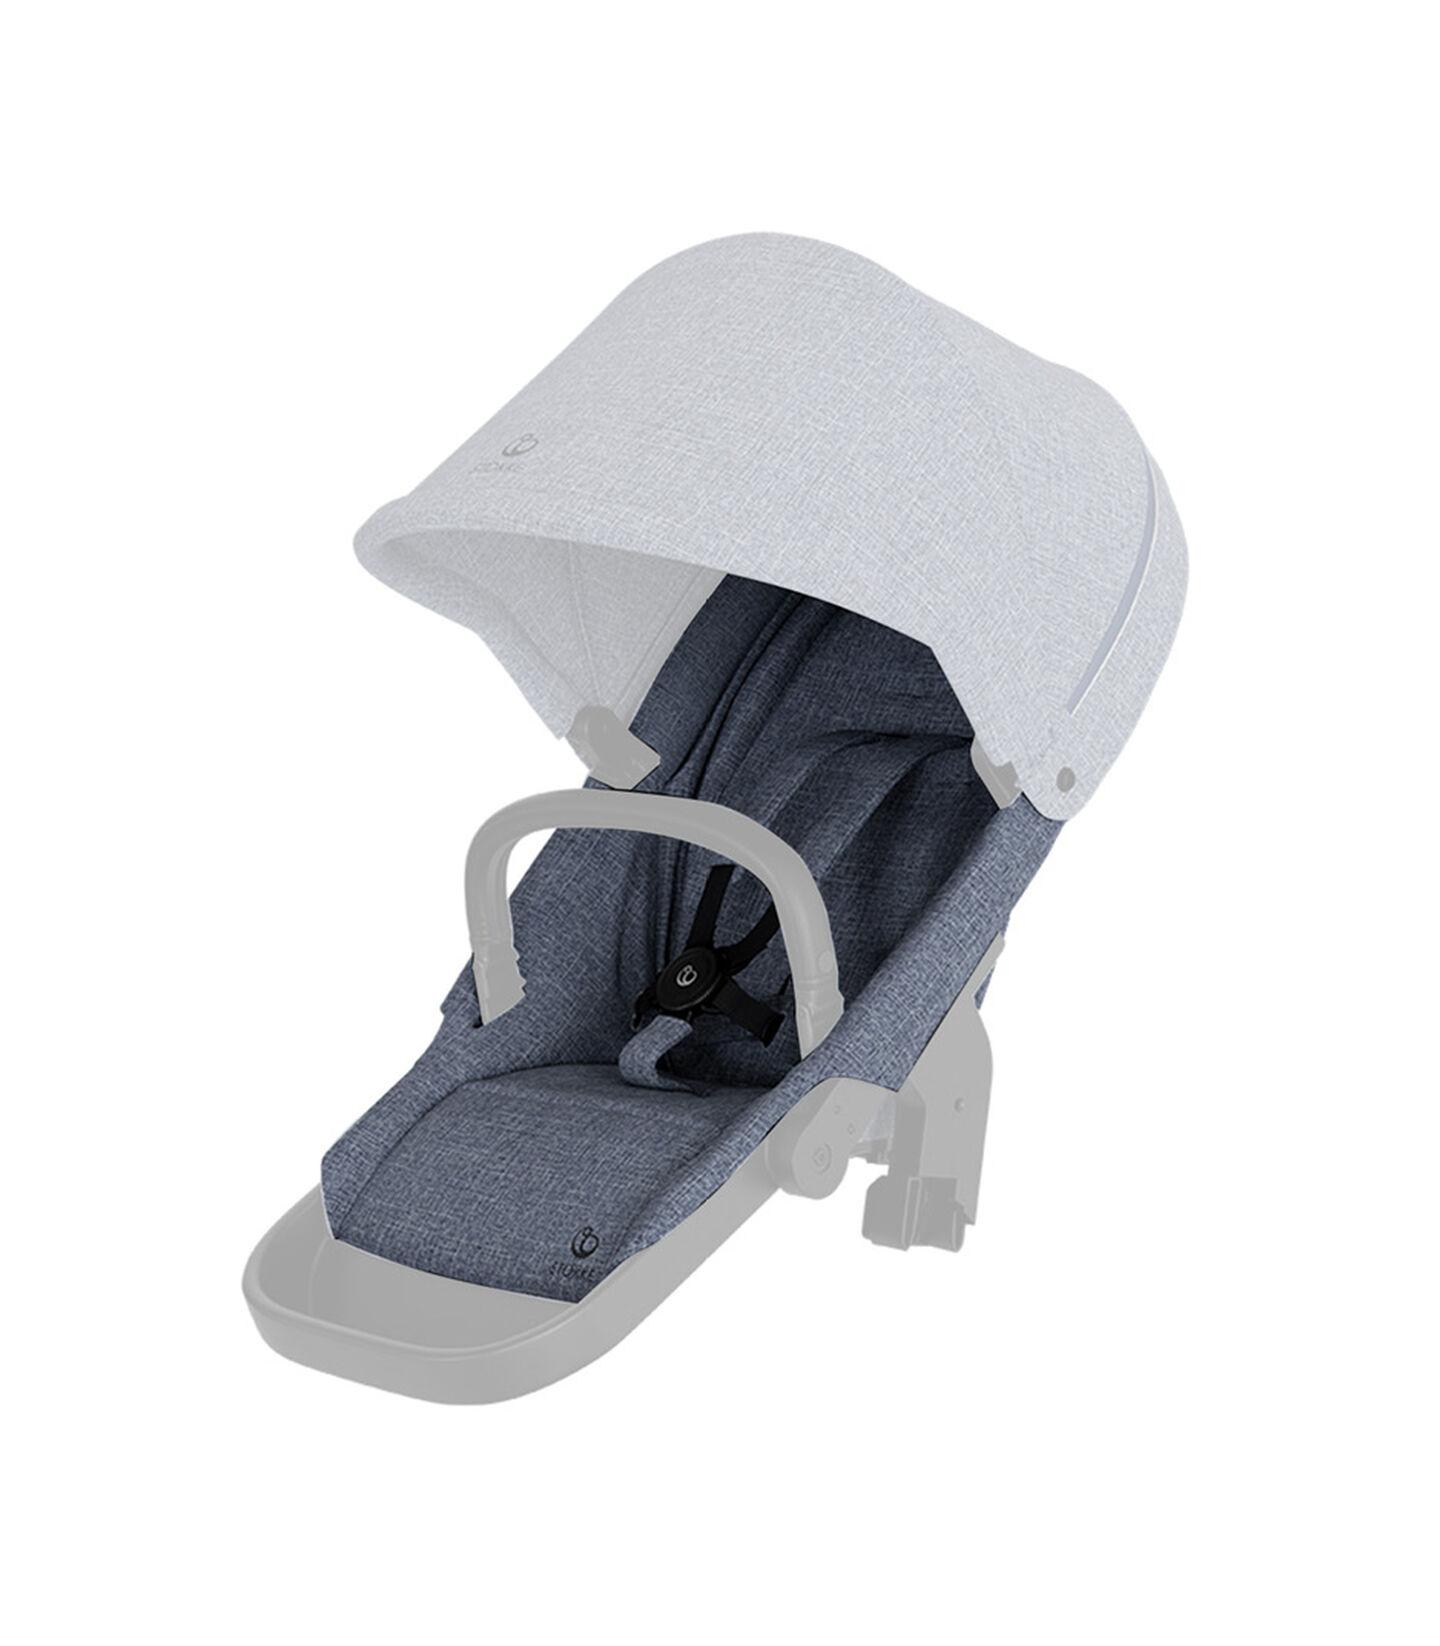 Stokke® Beat seat textile BlueMel wo Can Harness Shpg Basket, Azul Melange, mainview